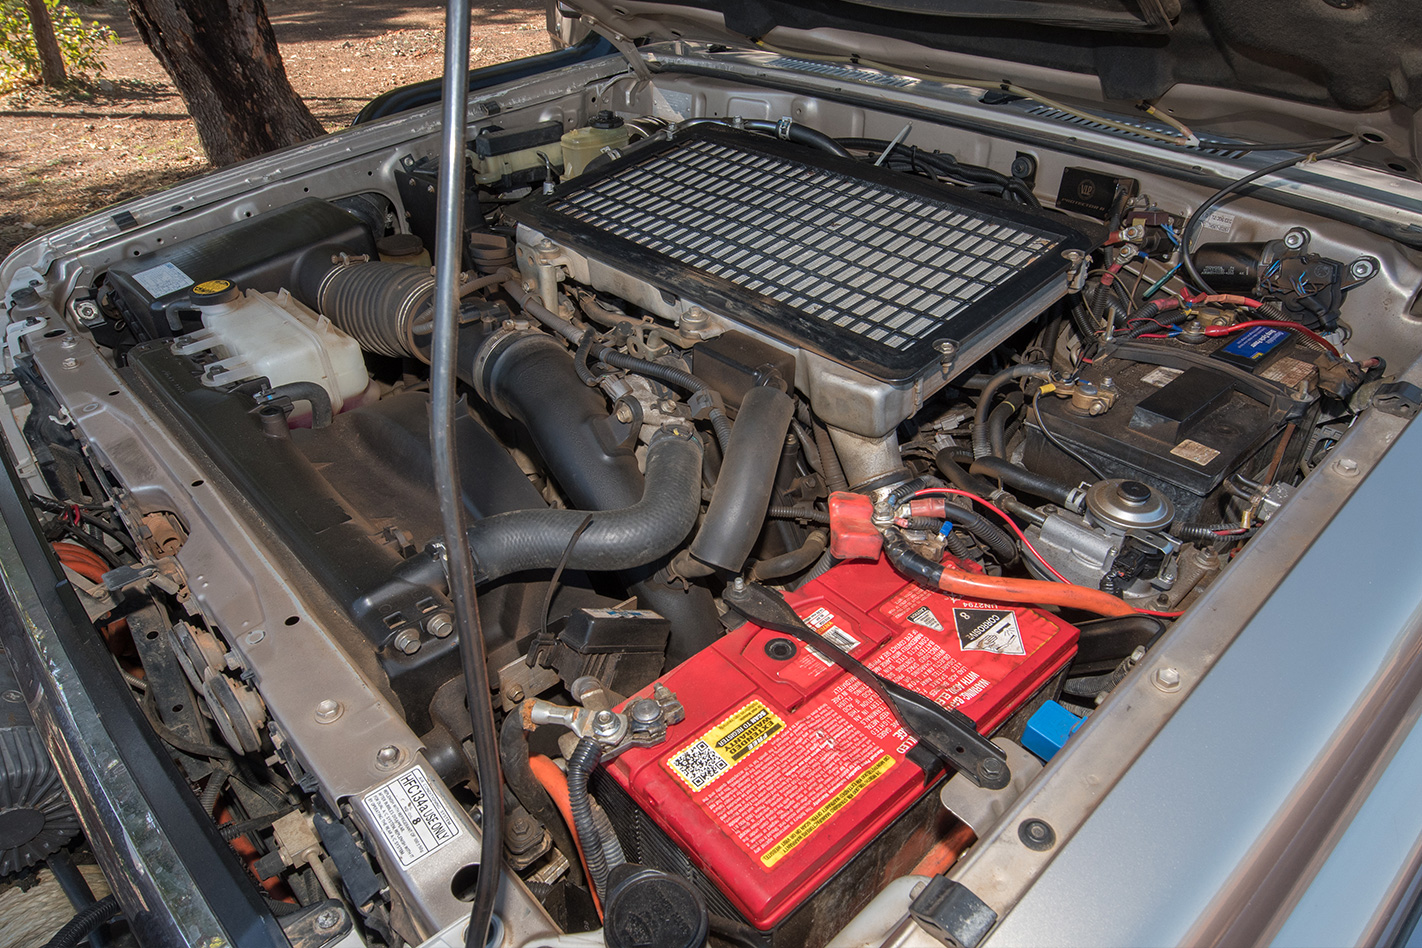 2008 Toyota Land Cruiser 76 GXL V8 engine